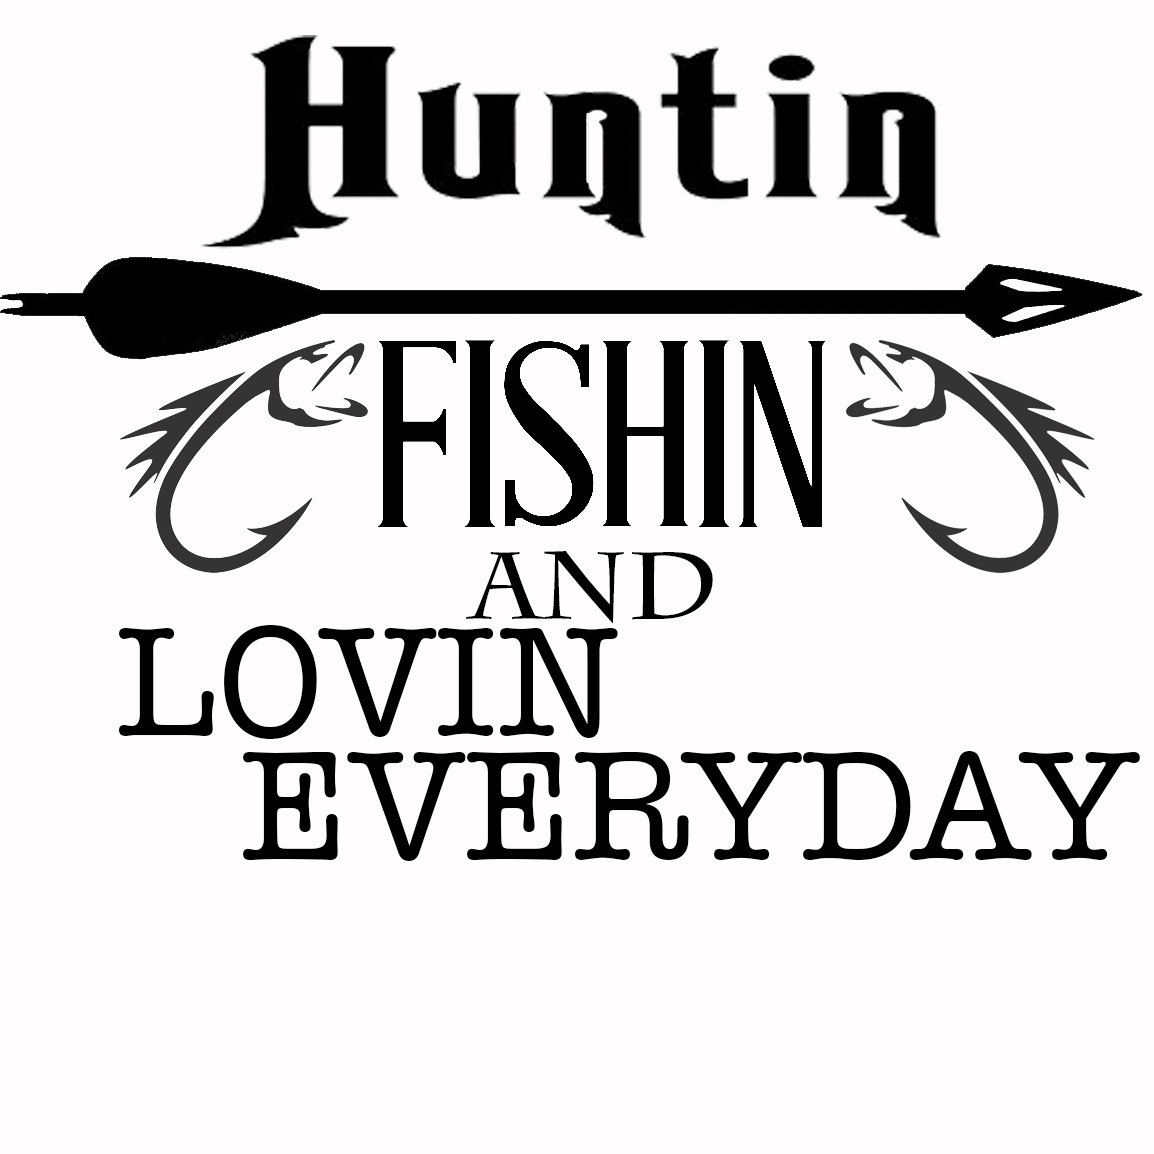 Hunting Fishing And Loving Everyday Luke Bryan Decal